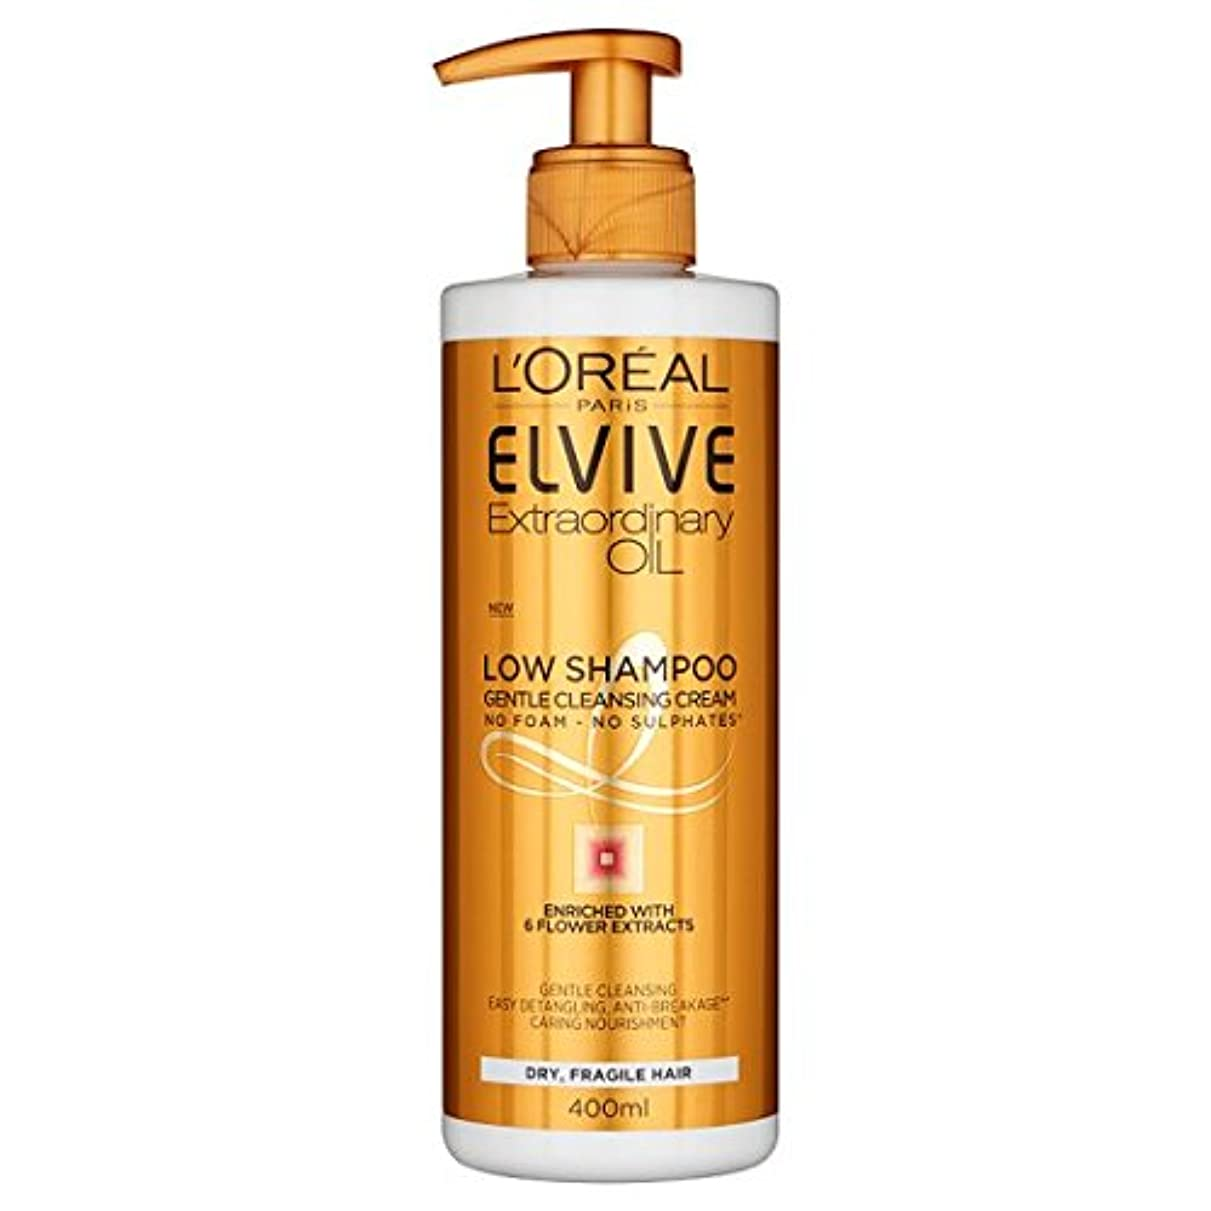 ラフ寸前飢饉L 'Oreal Elvive Außergewöhnlicher Öl niedrig Dry Shampoo 400 ml